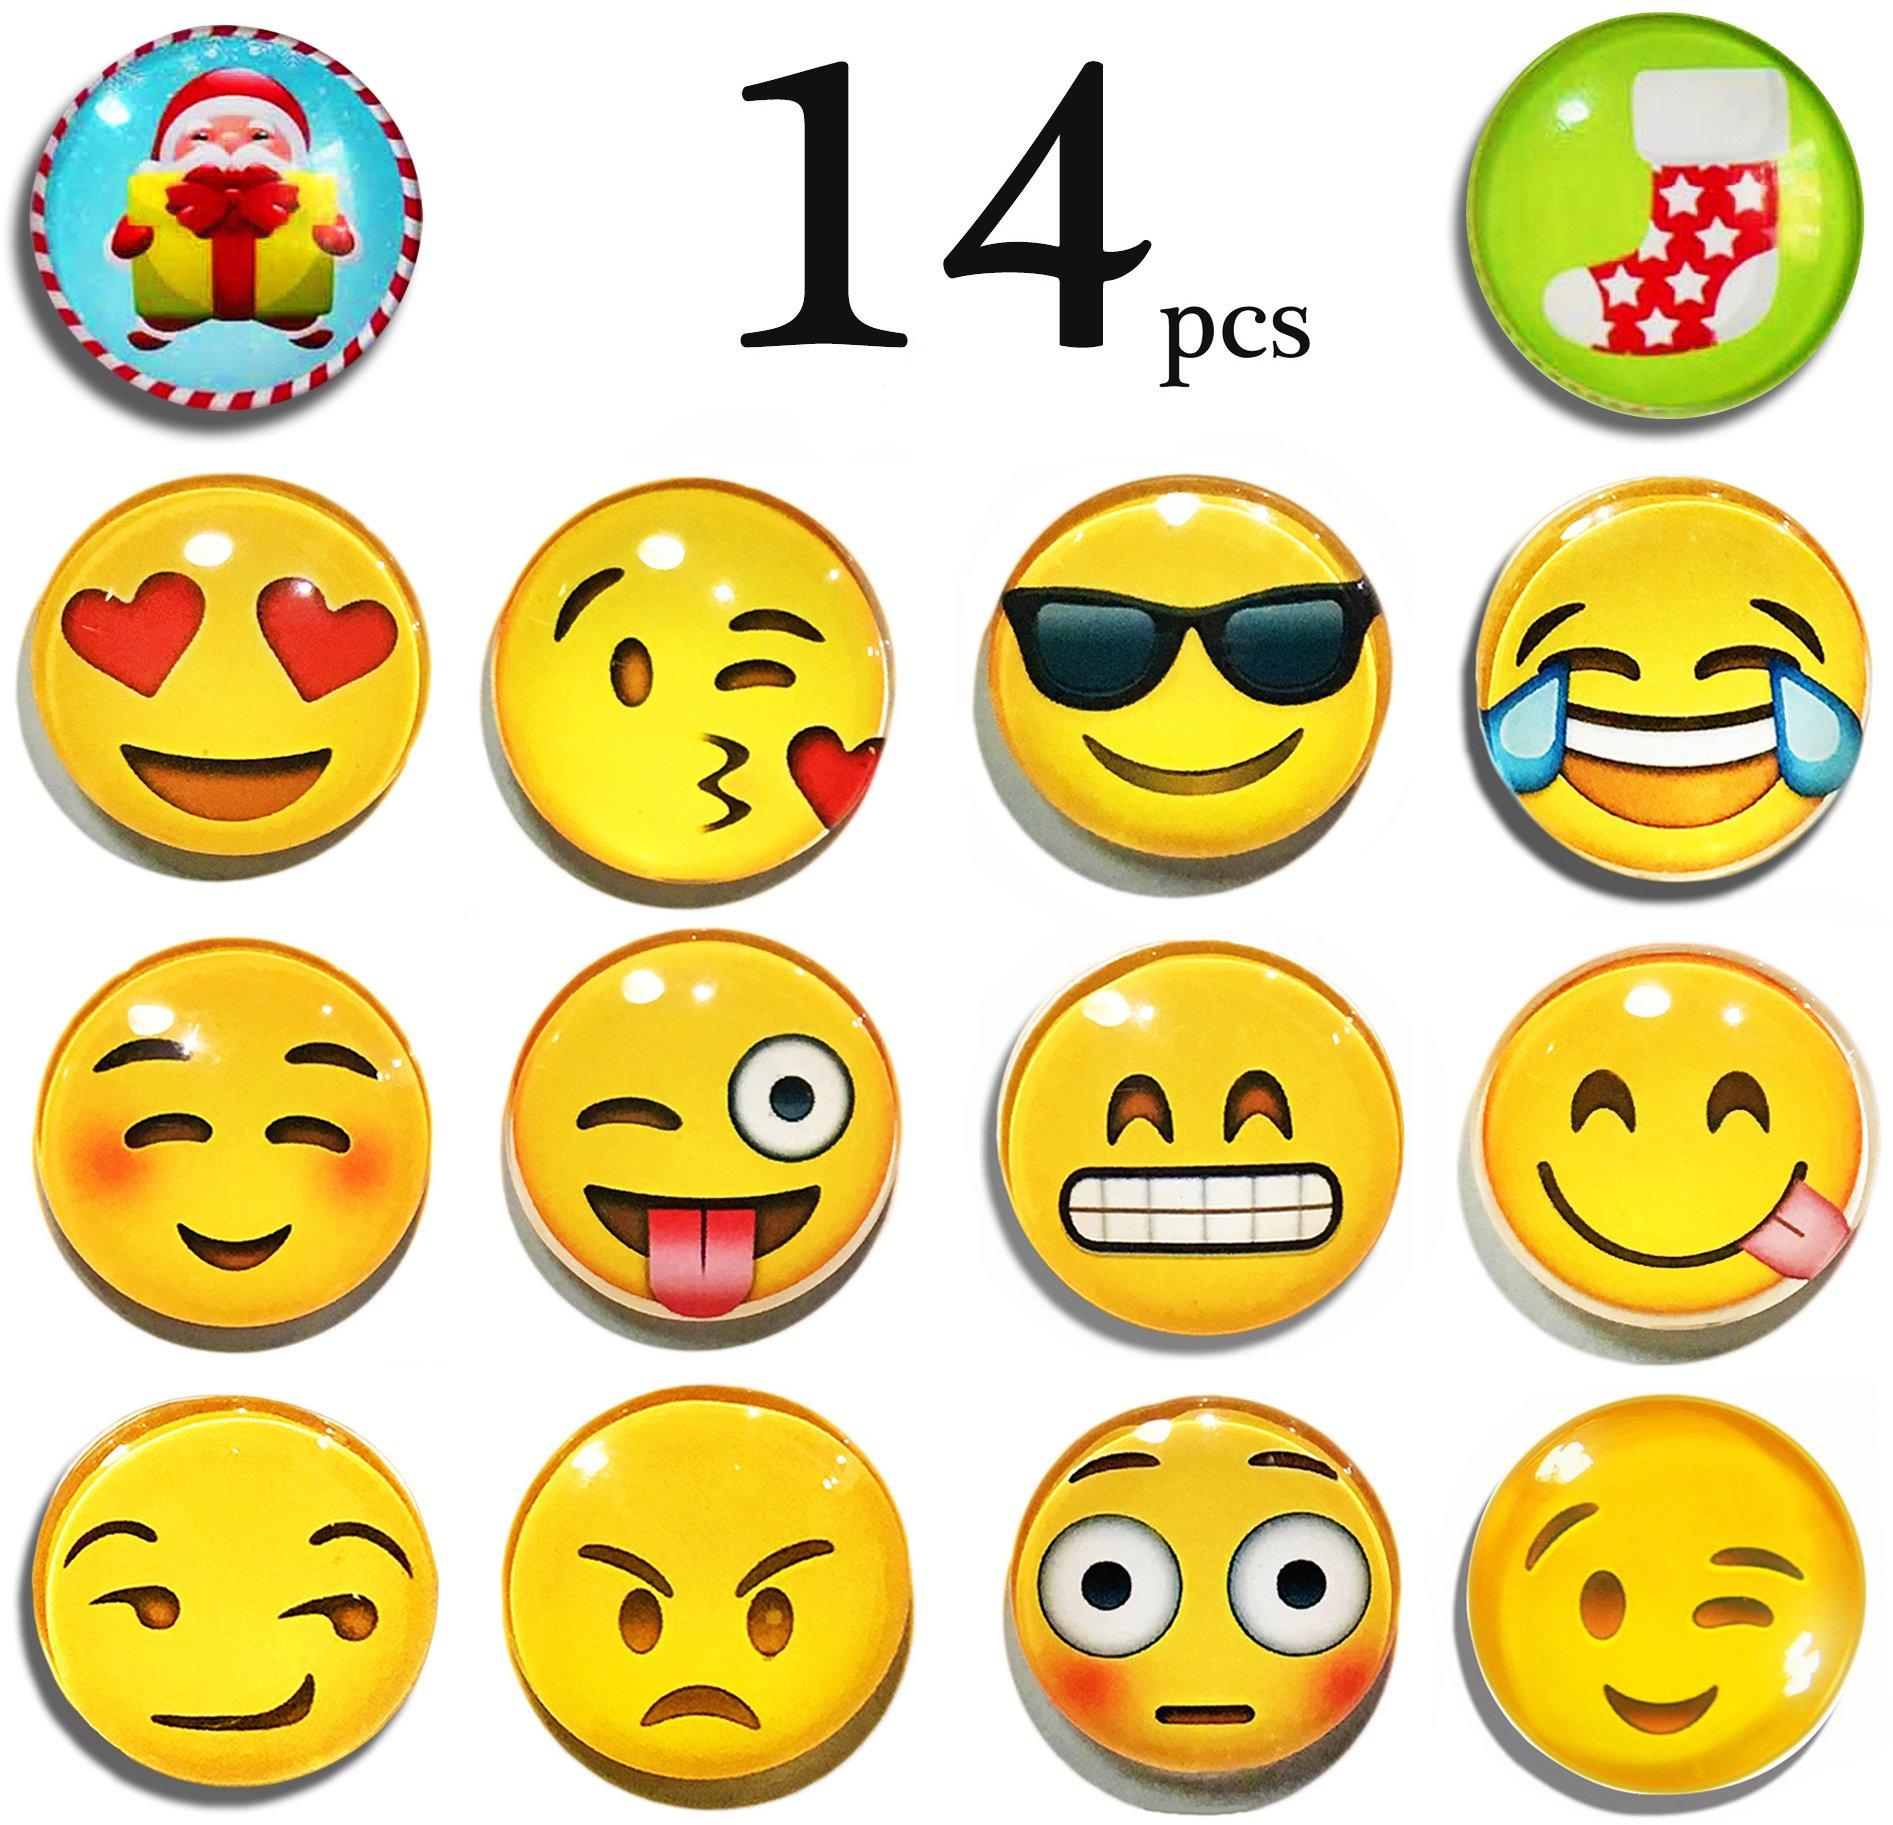 LimBridge 14-Pack Refrigerator Magnets, Emoji Magnets 3D Funny Cute School Lockers Accessories Set